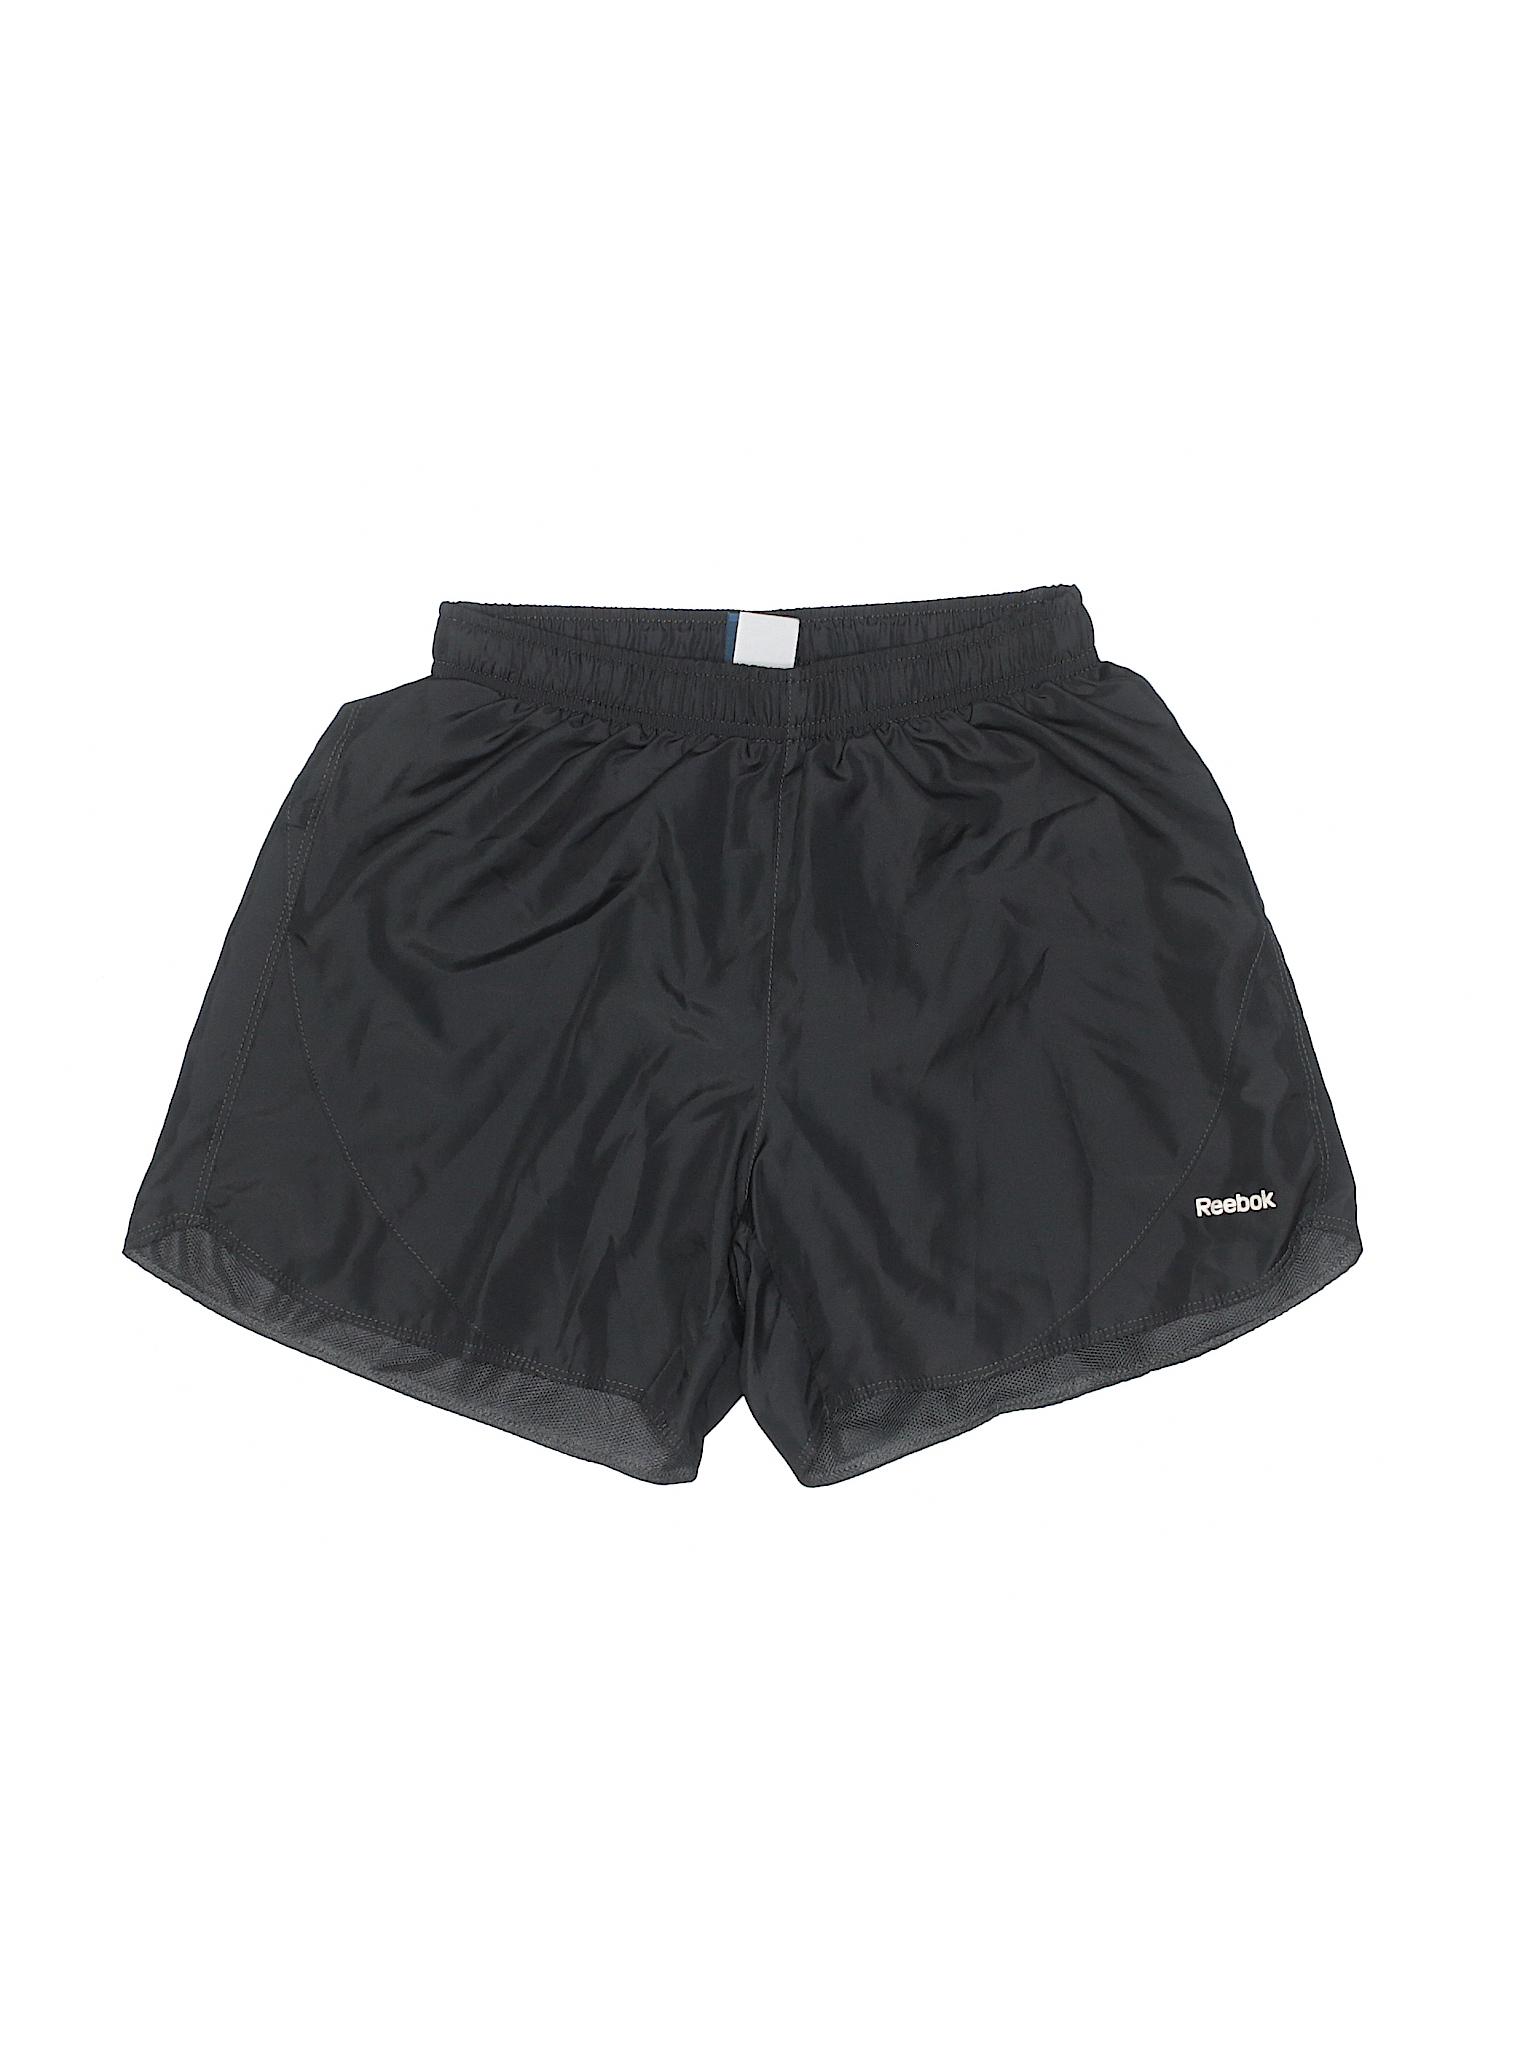 Reebok winter Leisure Leisure Shorts Athletic Shorts Athletic winter winter Reebok Leisure a47xX4wRq